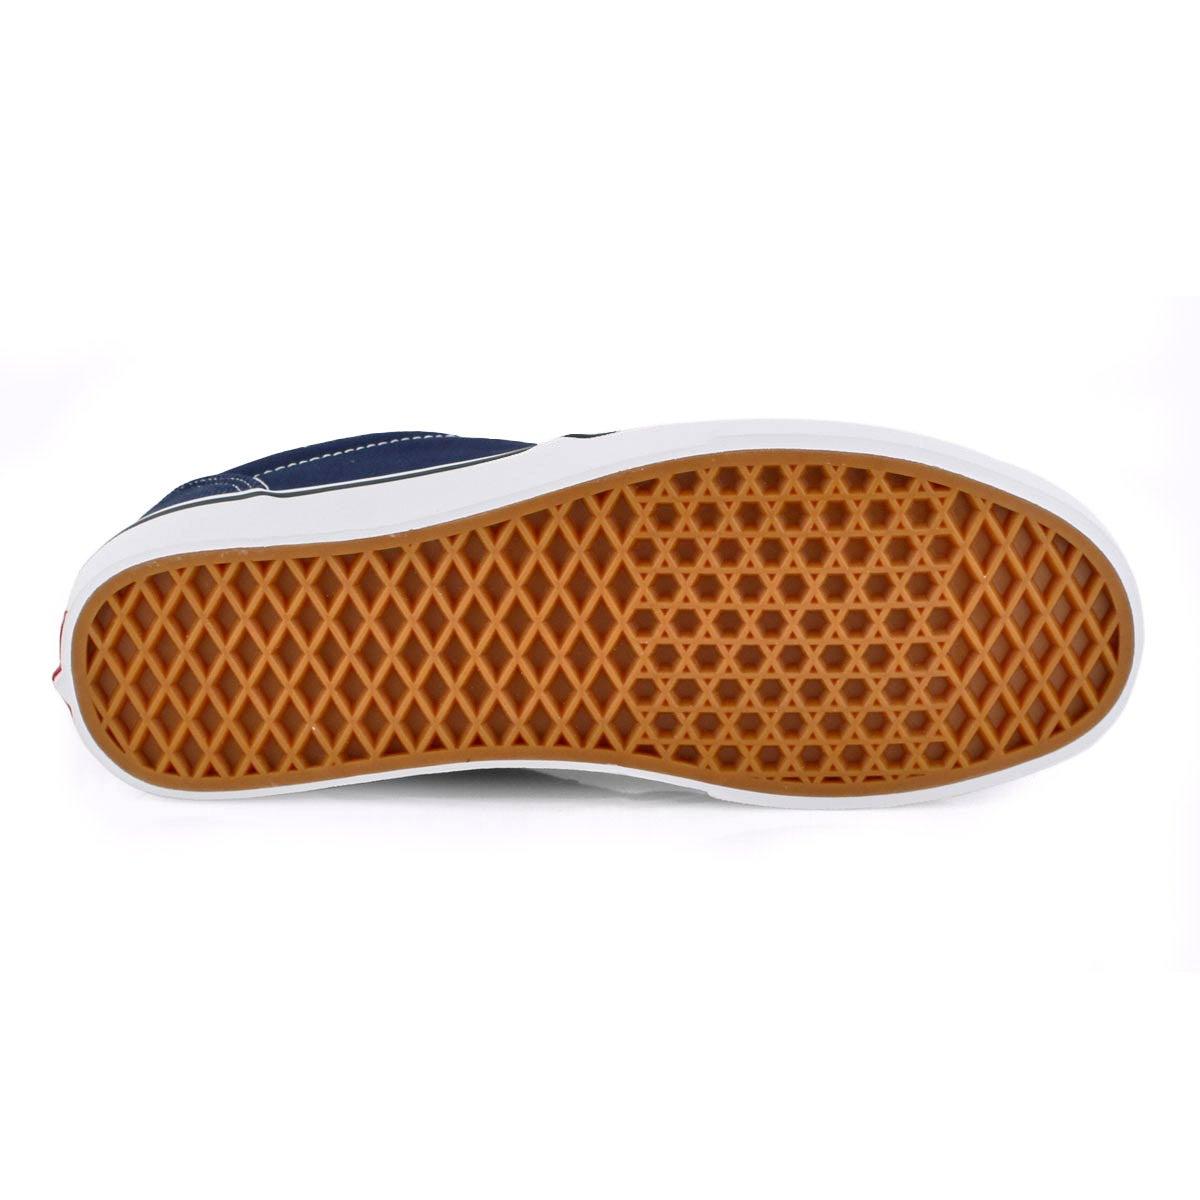 Vans/' Men/'s Atwood Corduroy Lace Up Sneaker